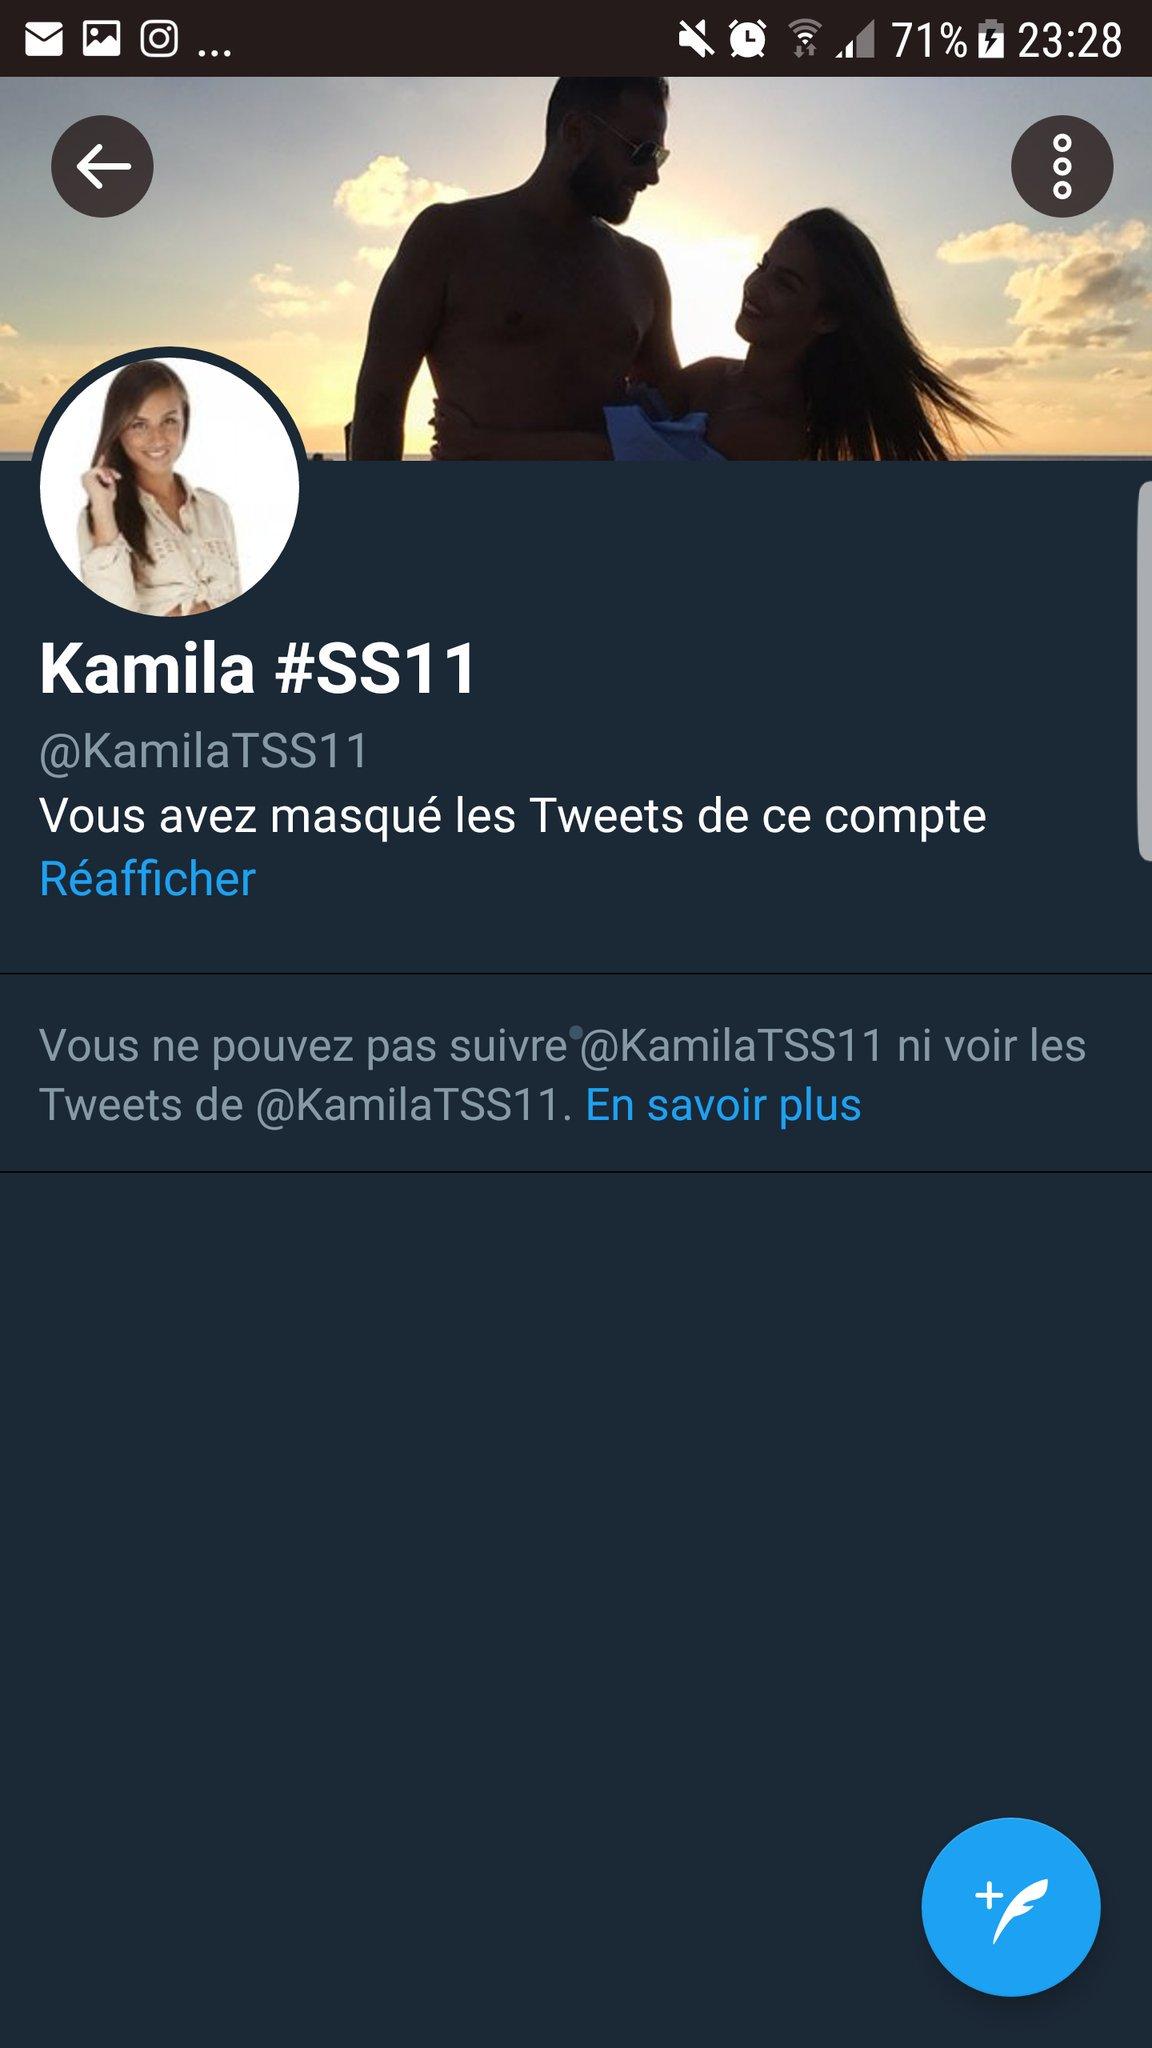 Jual Murah Tss11 Update 2018 Bonia B10141 1133c Jam Tangan Pria Gold Teamnomilass11teamnoiremelaa3 On Twitter Il Faut Signaler Le Compte Fake Sur Kamila Vrai De C Est